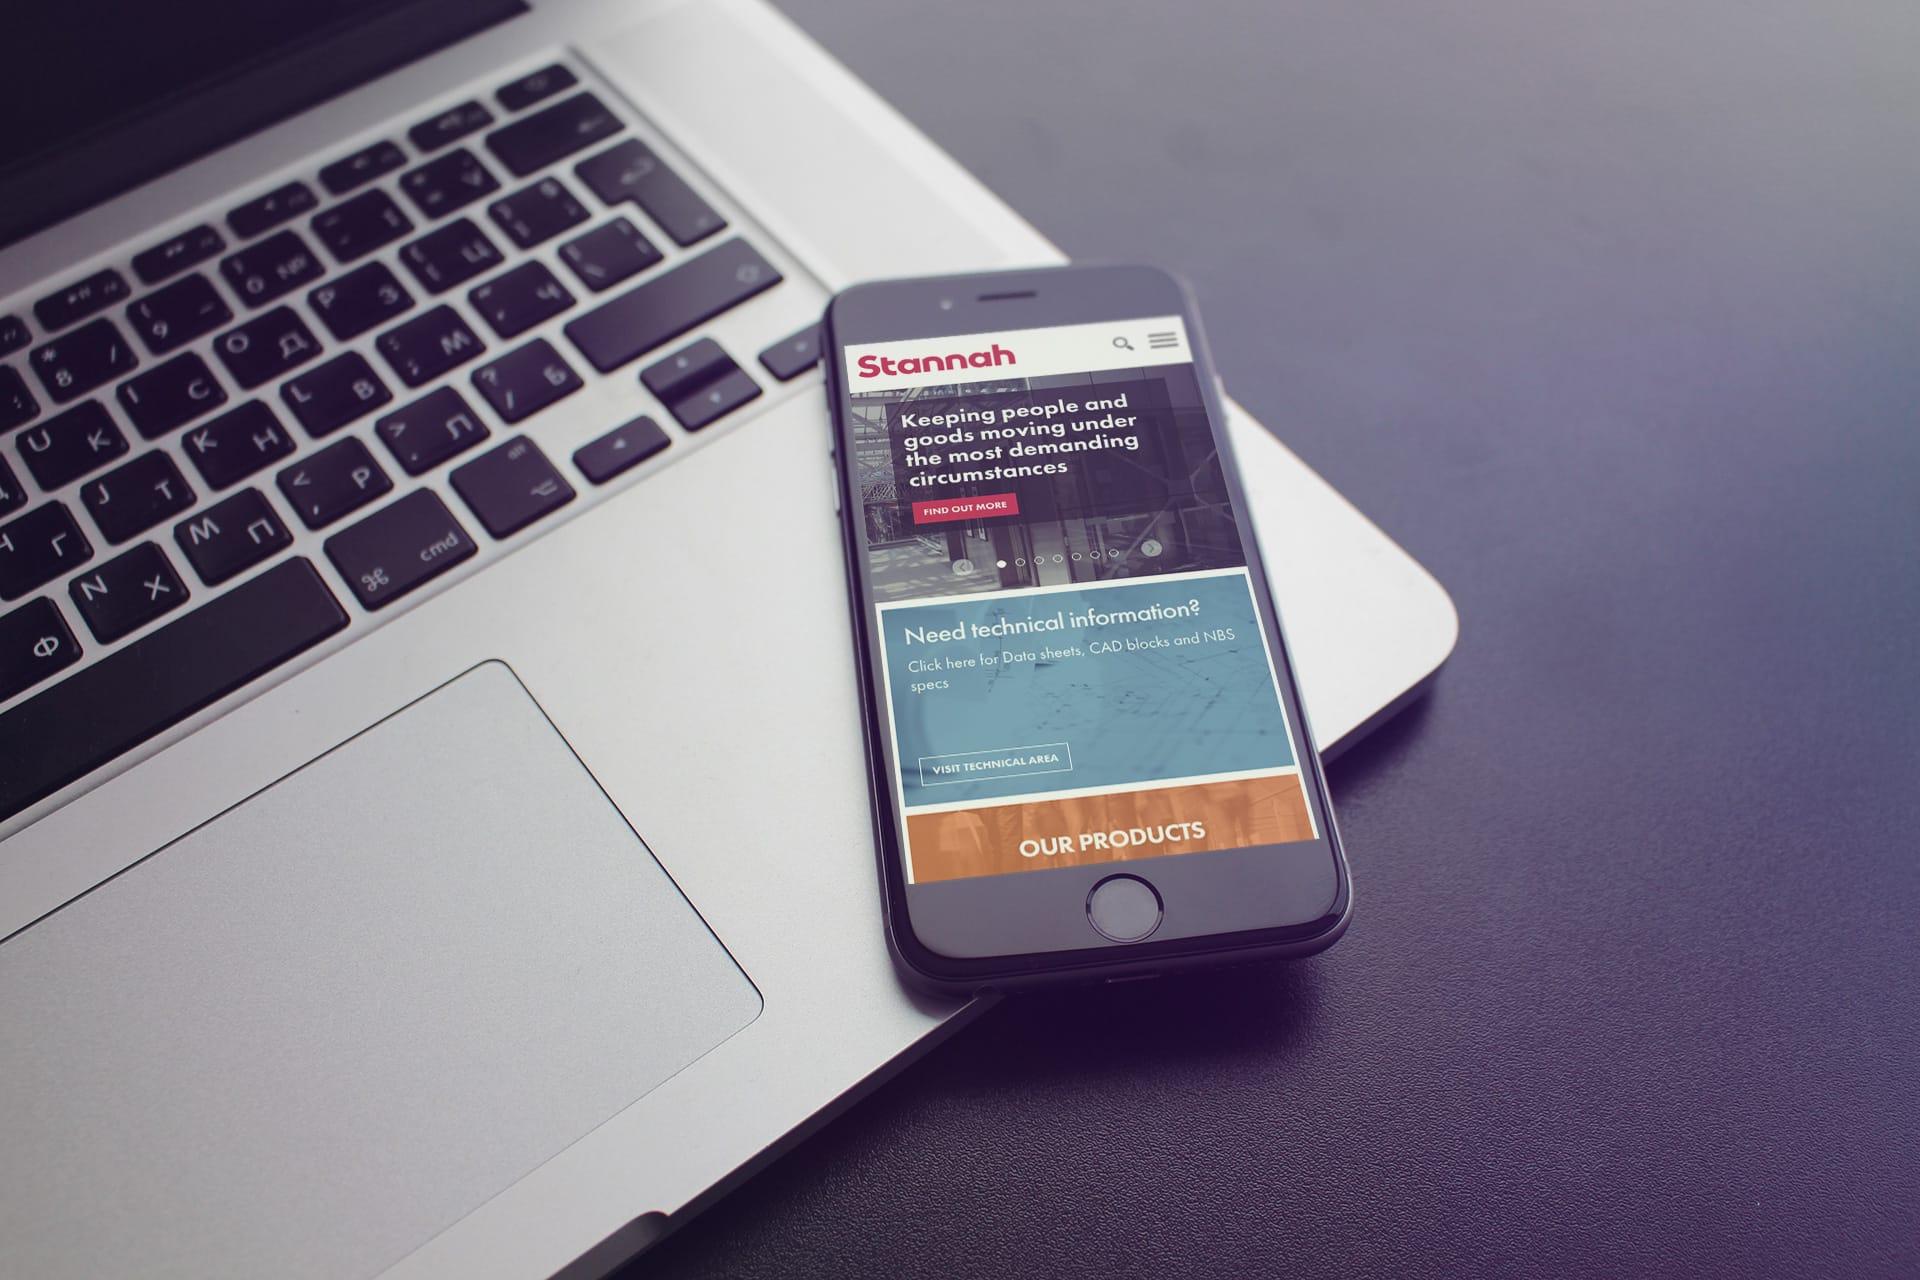 stannah-website-mobile-mockup-3